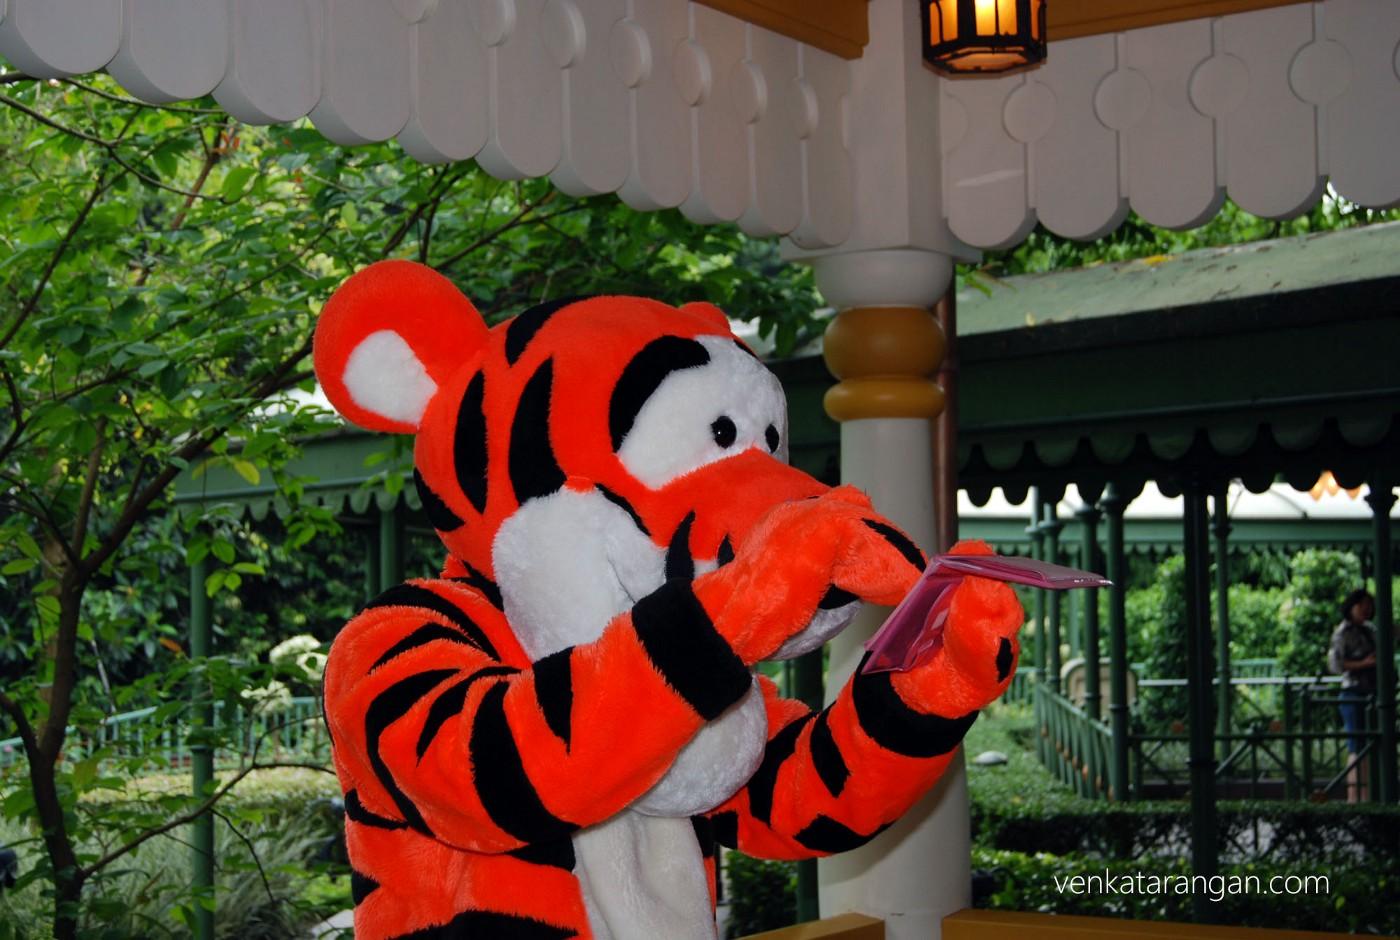 Tigger, the tiger signing his autograph